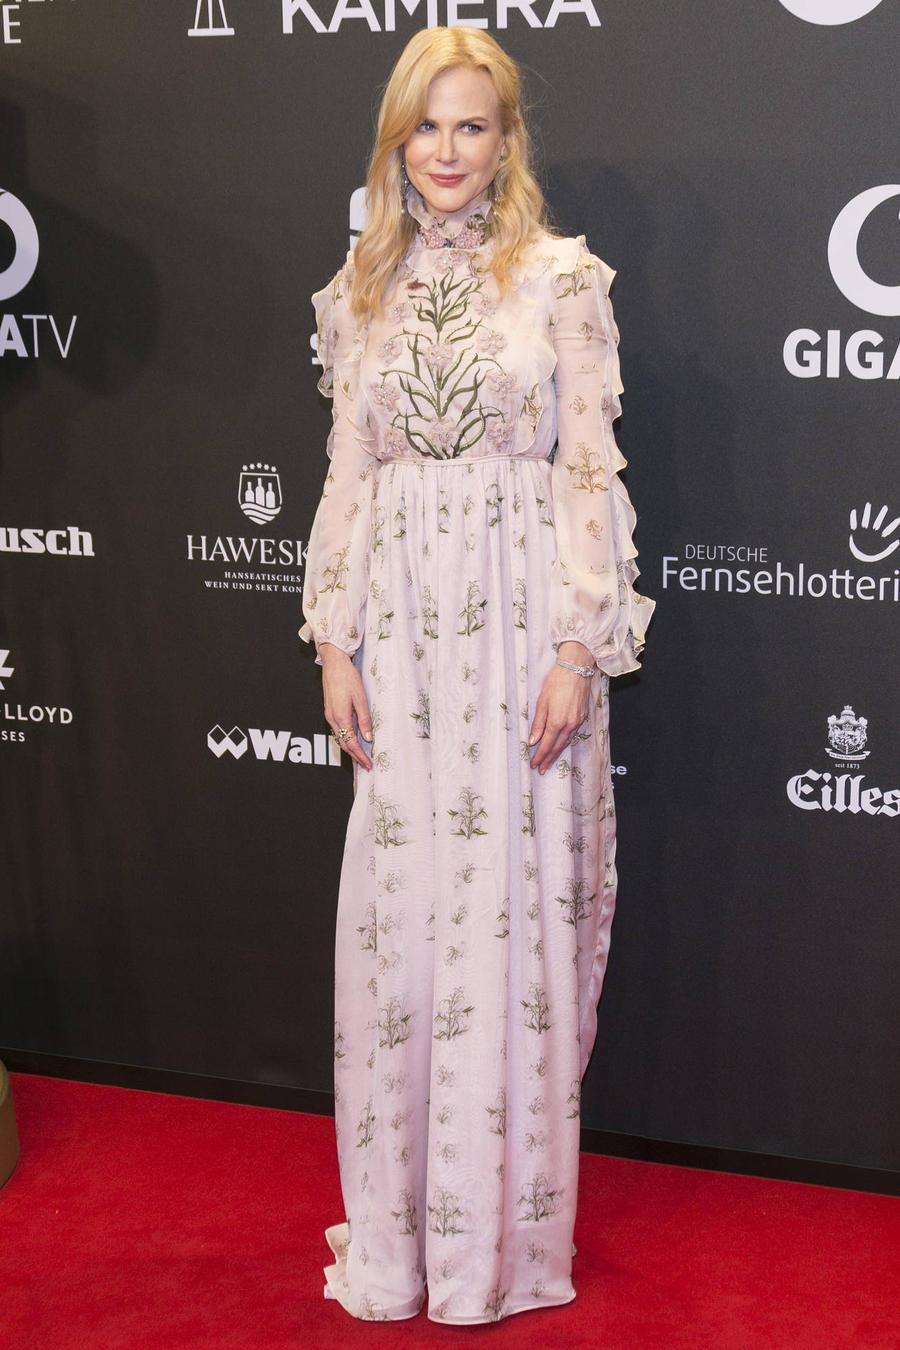 Nicole Kidman Left In Pain After Domestic Violence Scenes In Big Little Lies